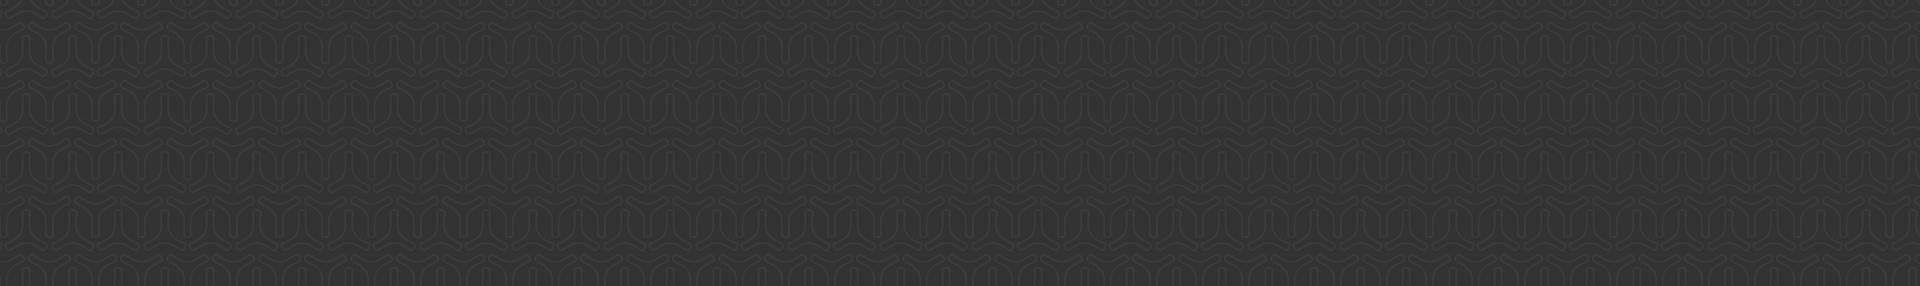 Blog_Default_Banner.jpg